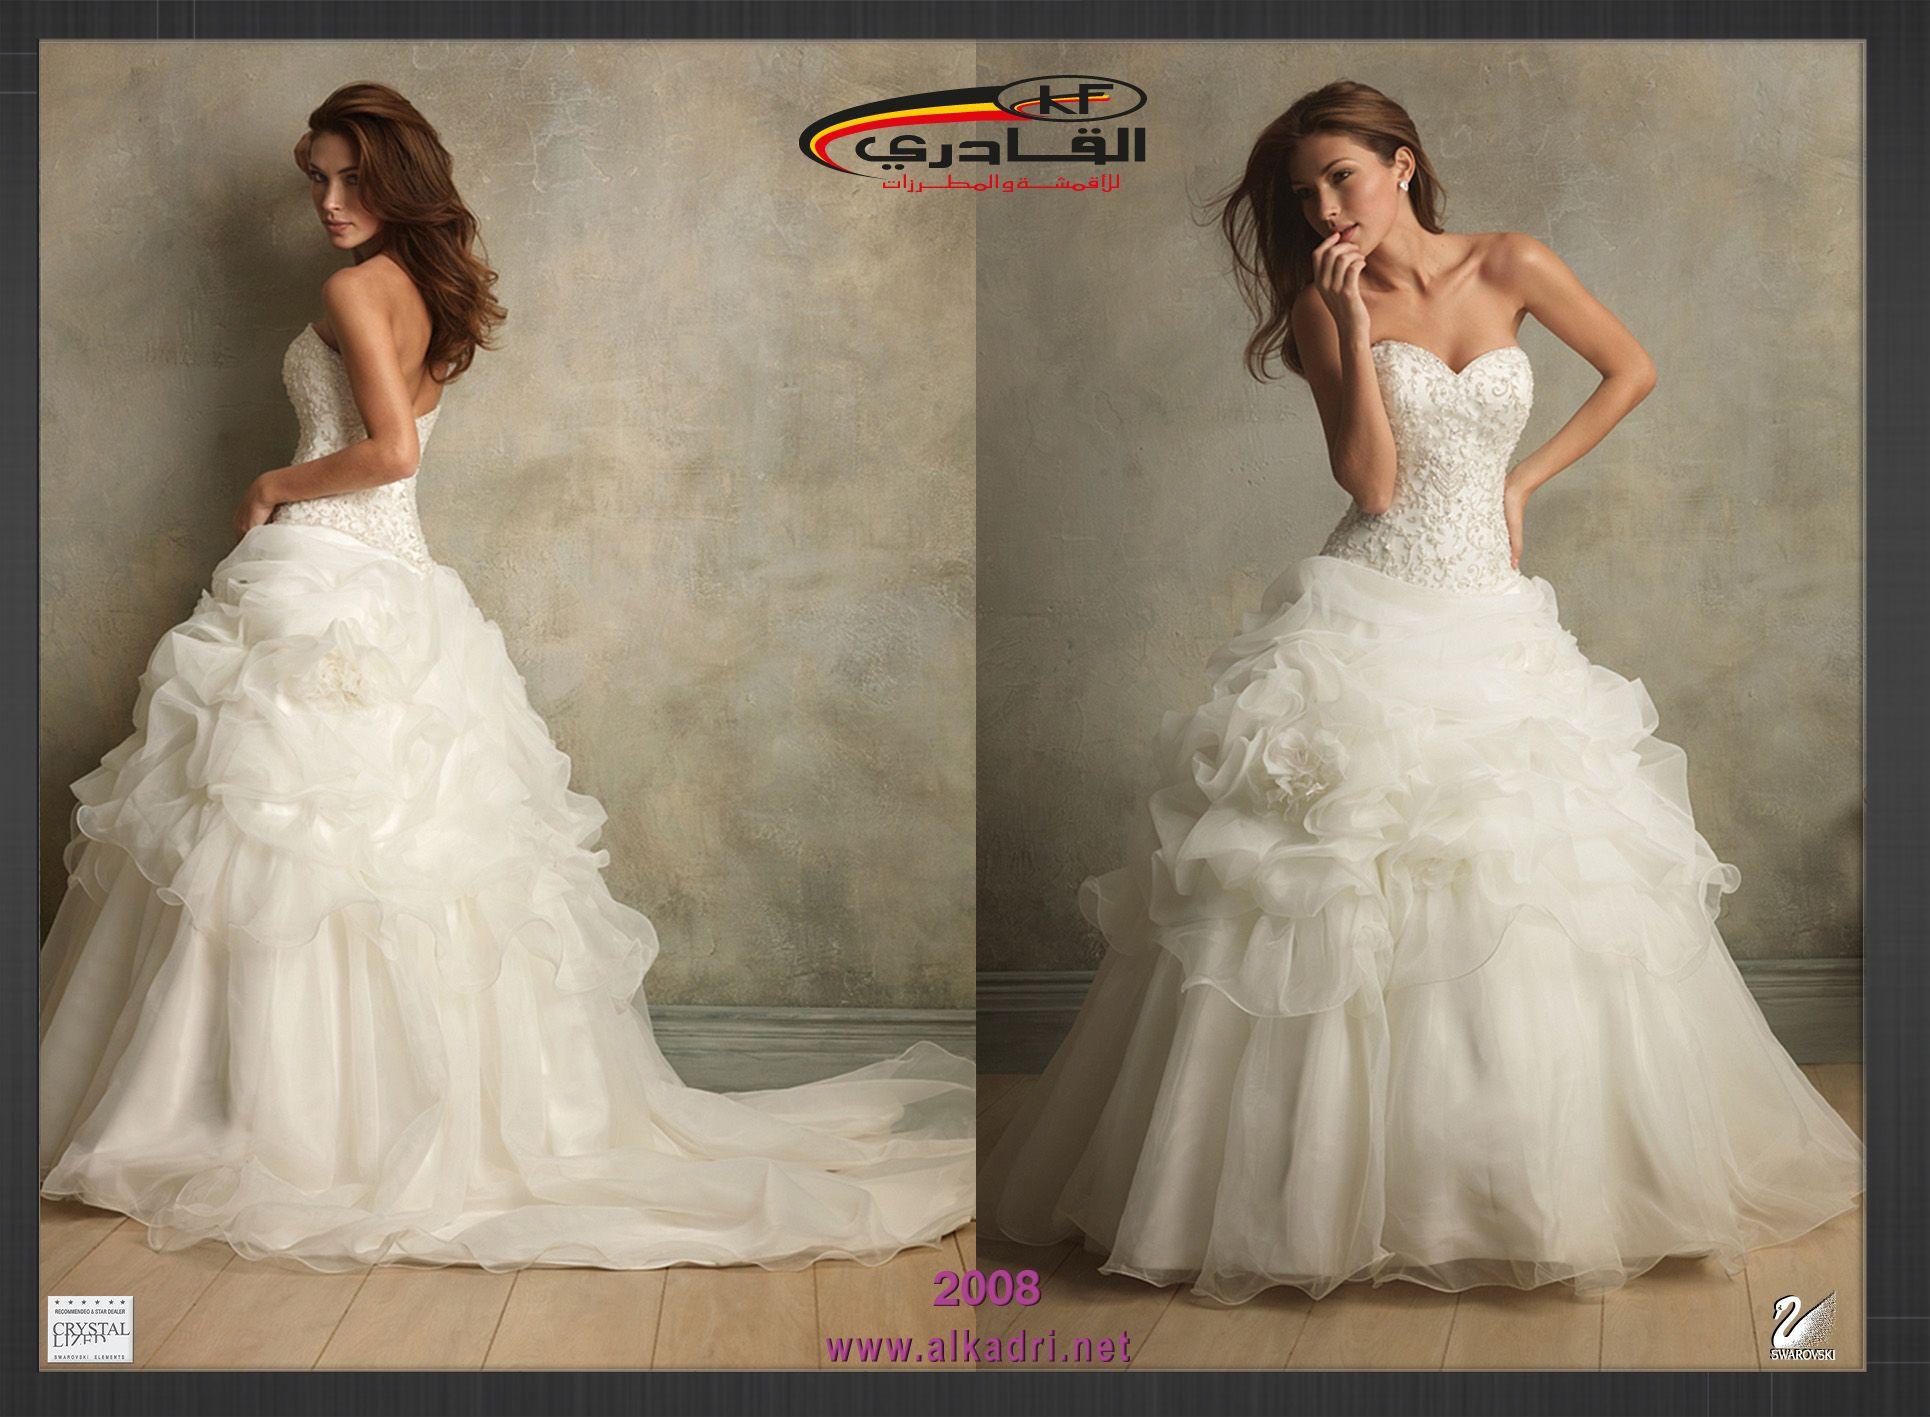 Https Www Facebook Com Alkadriforcouture Haute Coutre Collection Yemen Sana A Gamal St Tel 967 1 498 140 Dresses Wedding Dresses Mermaid Wedding Dress